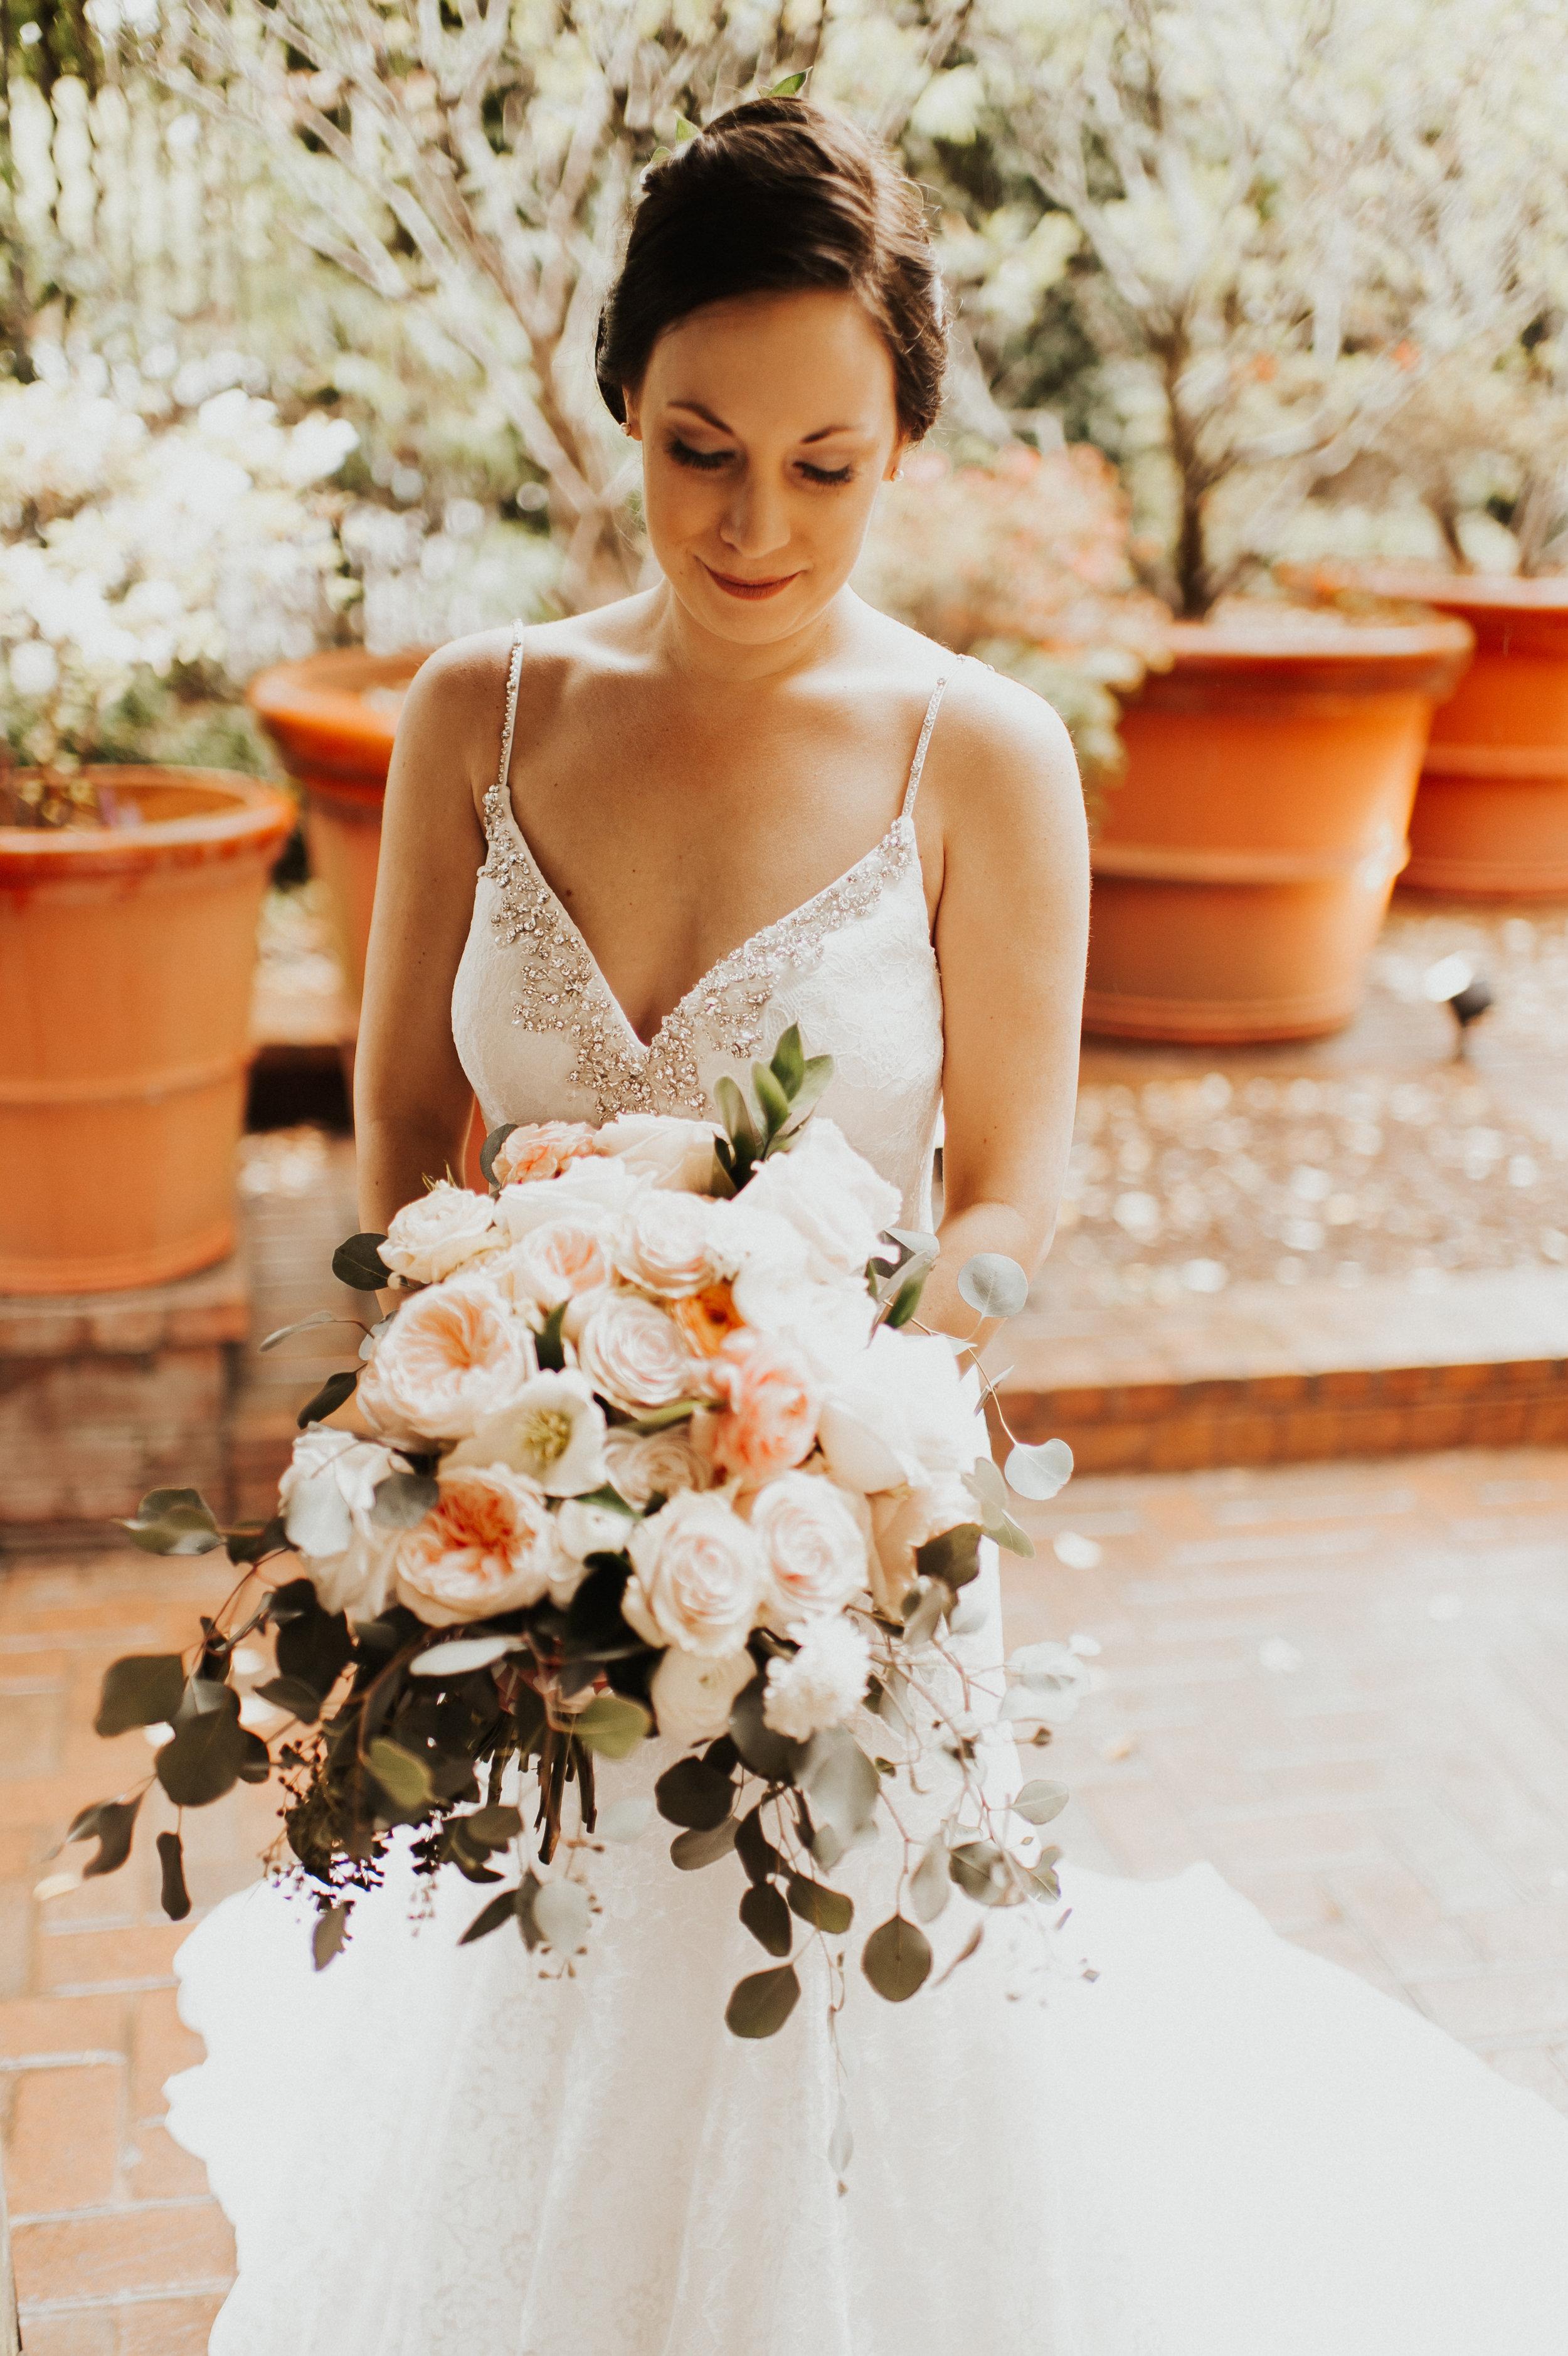 savannah-bridal-shop-andrea-and-mike-evergold-photography-georgia-state-railroad-museum-wedding-savannah-wedding-florist-savannah-wedding-planner-36.jpg